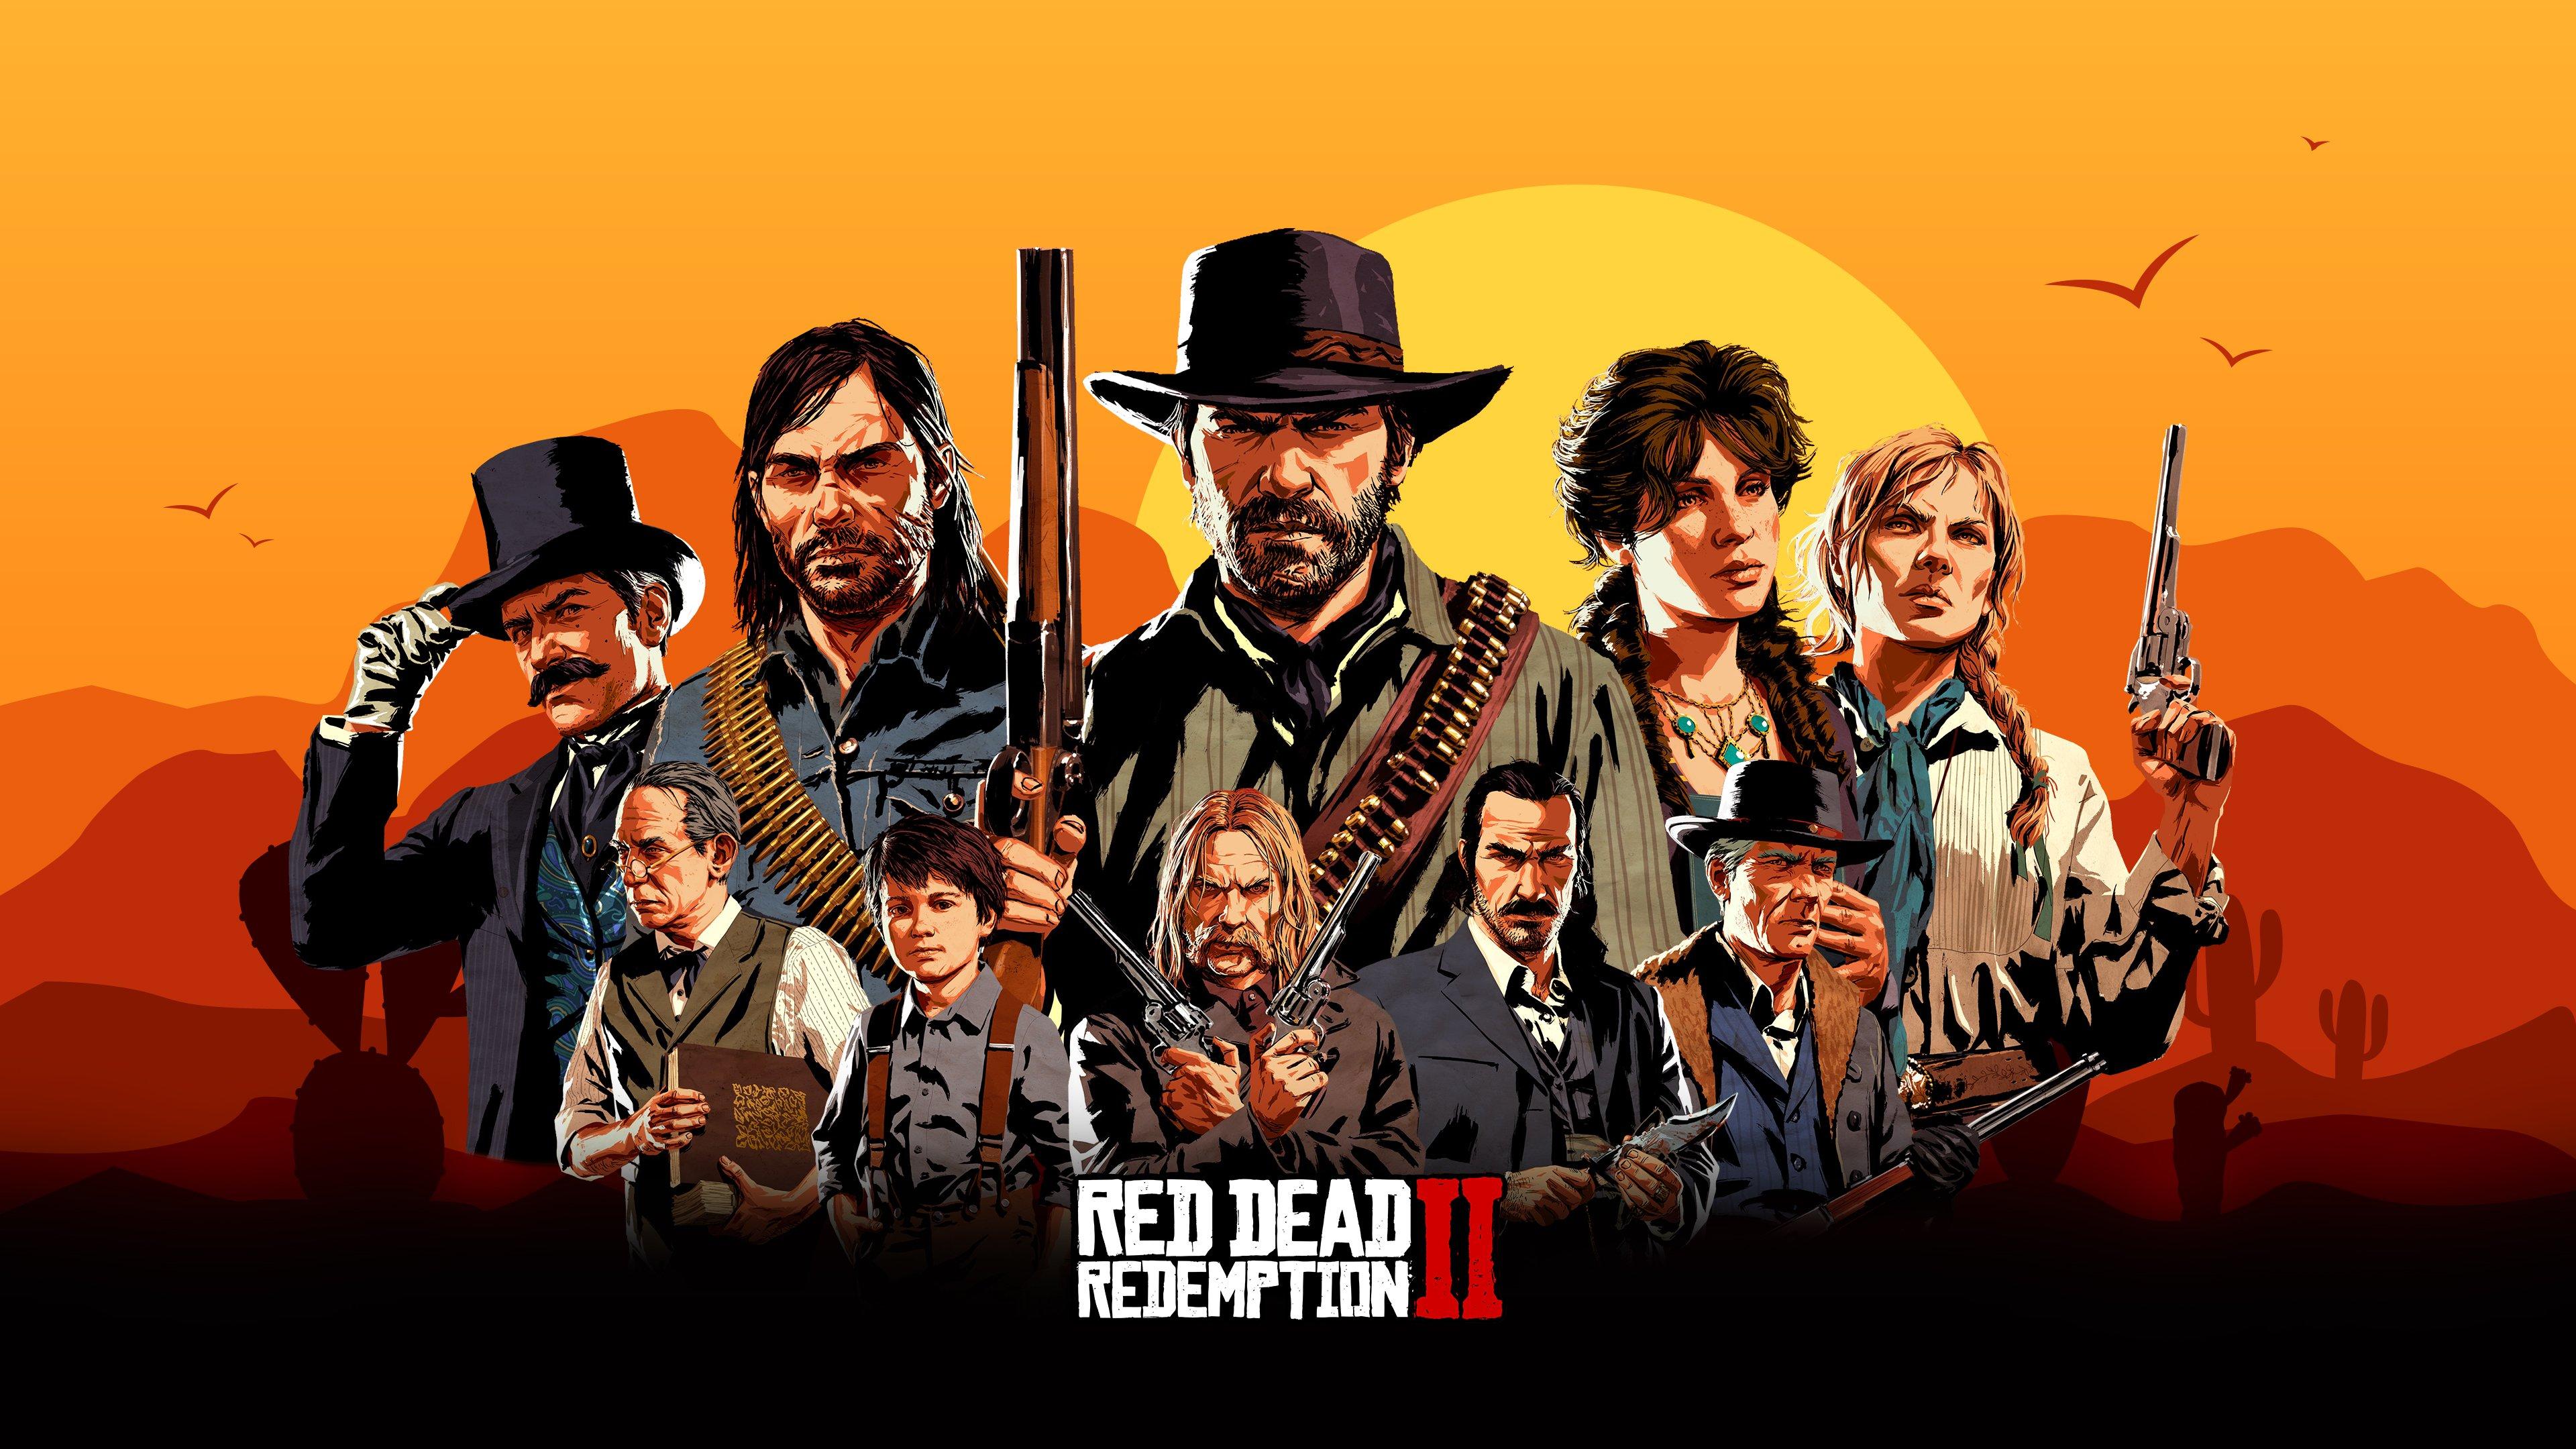 Fondos de pantalla Red Dead Redemption 2 Cover Personajes